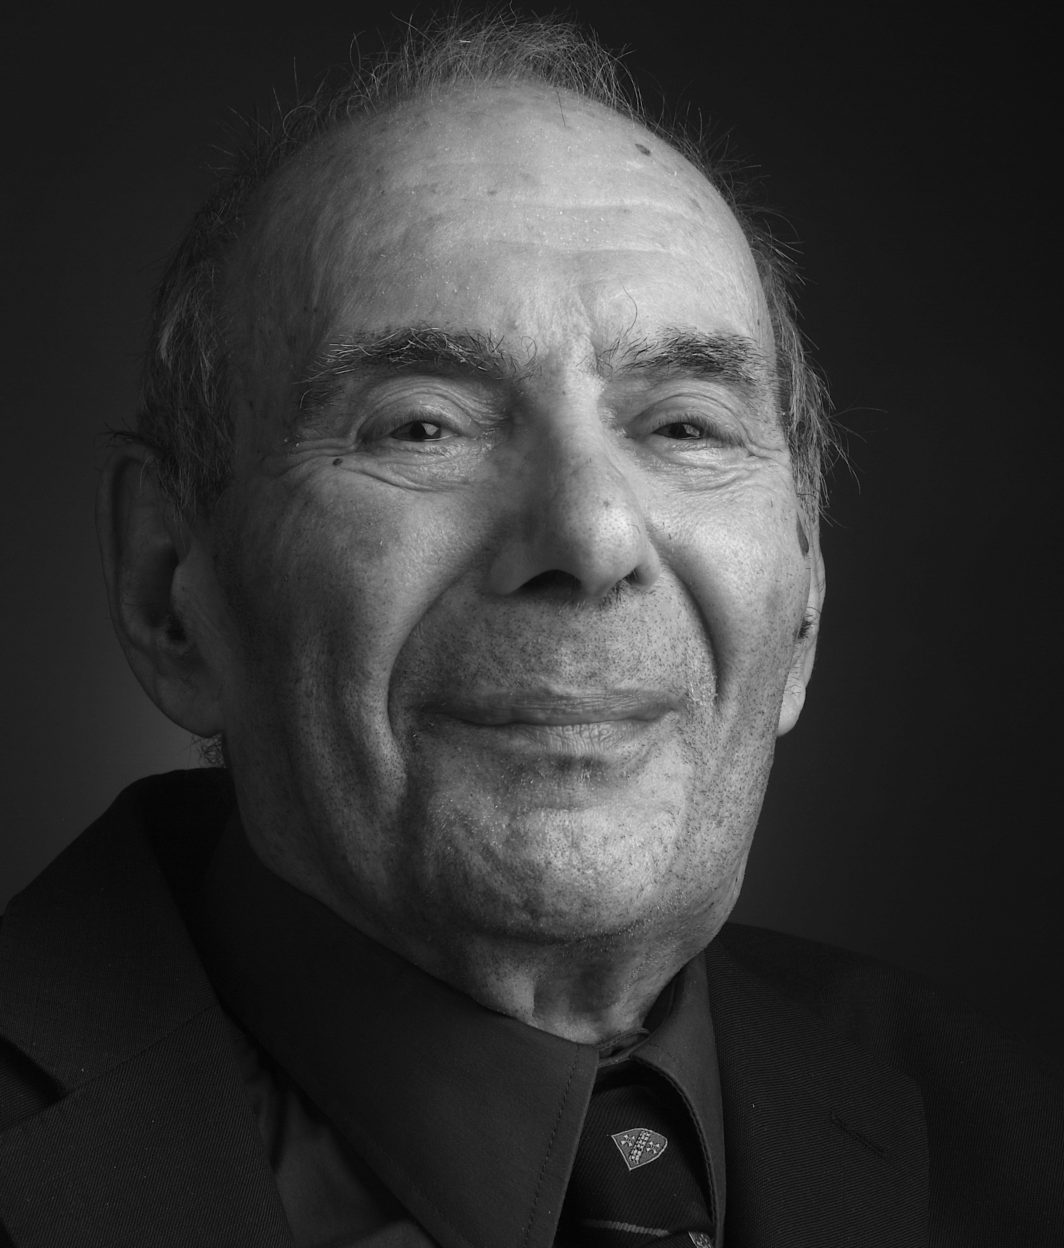 Rabbi Lionel Blue, picture by Ajamu